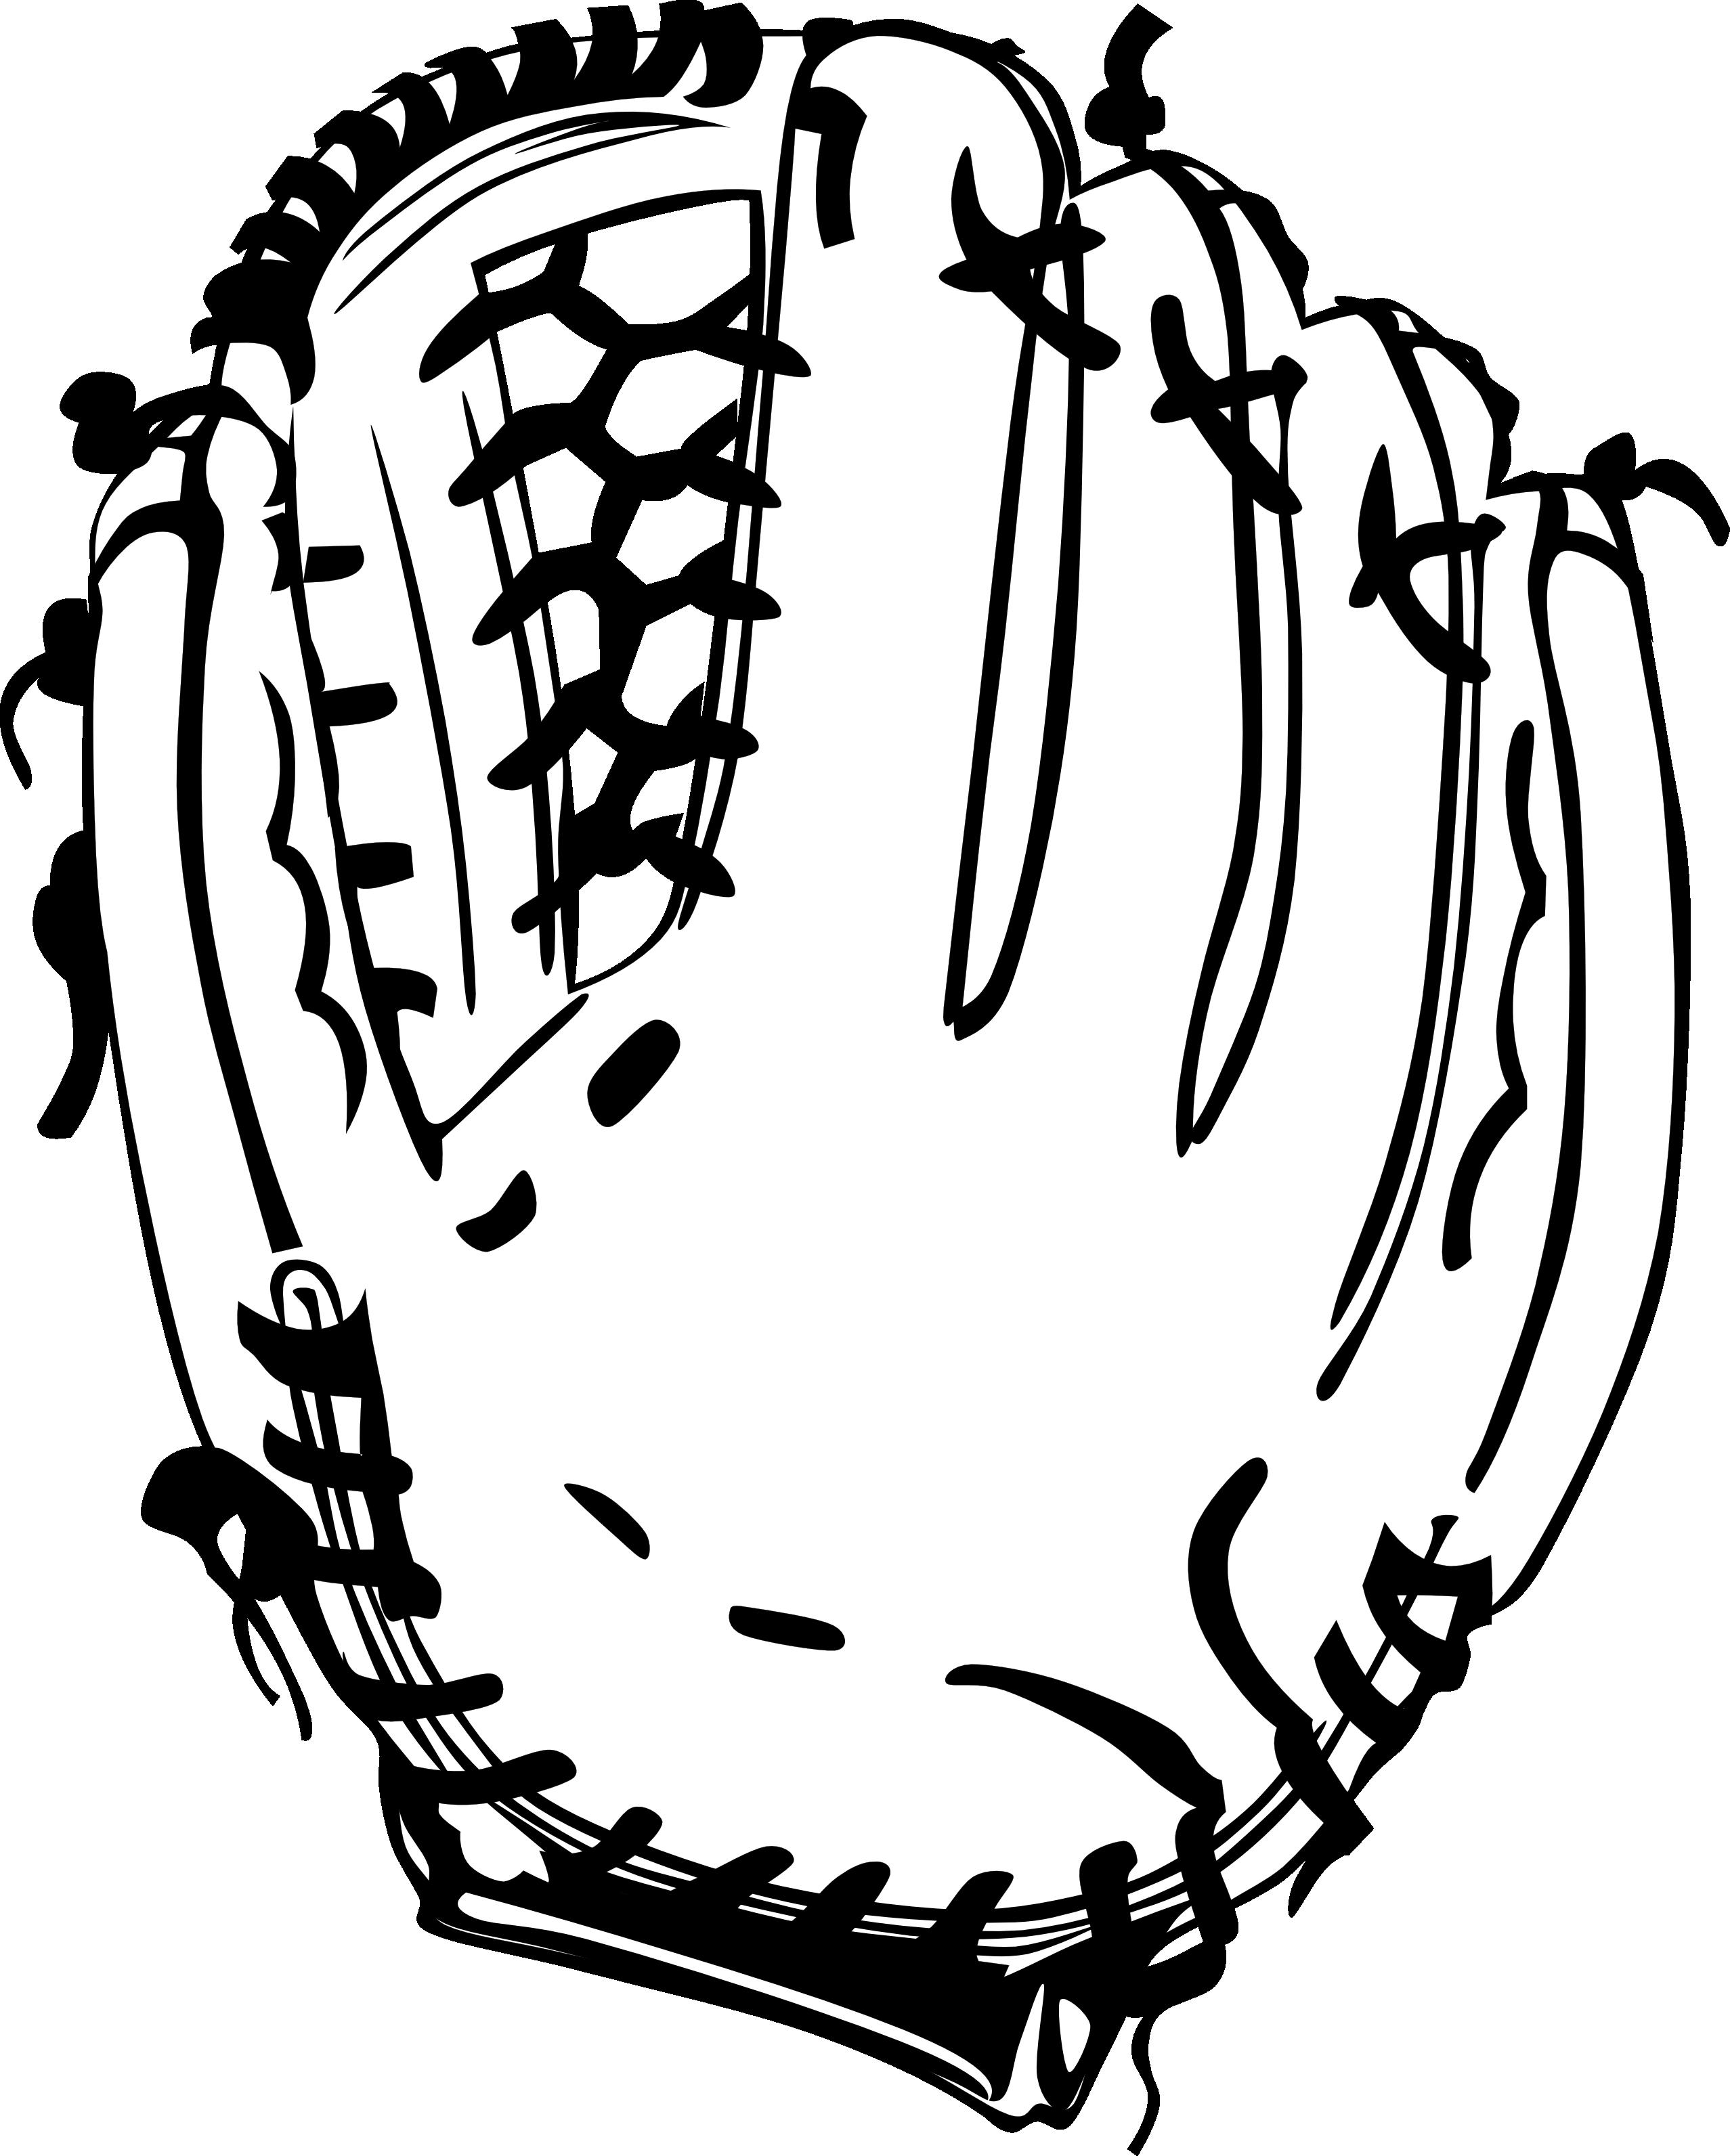 Glove clipart black and white, Glove black and white.